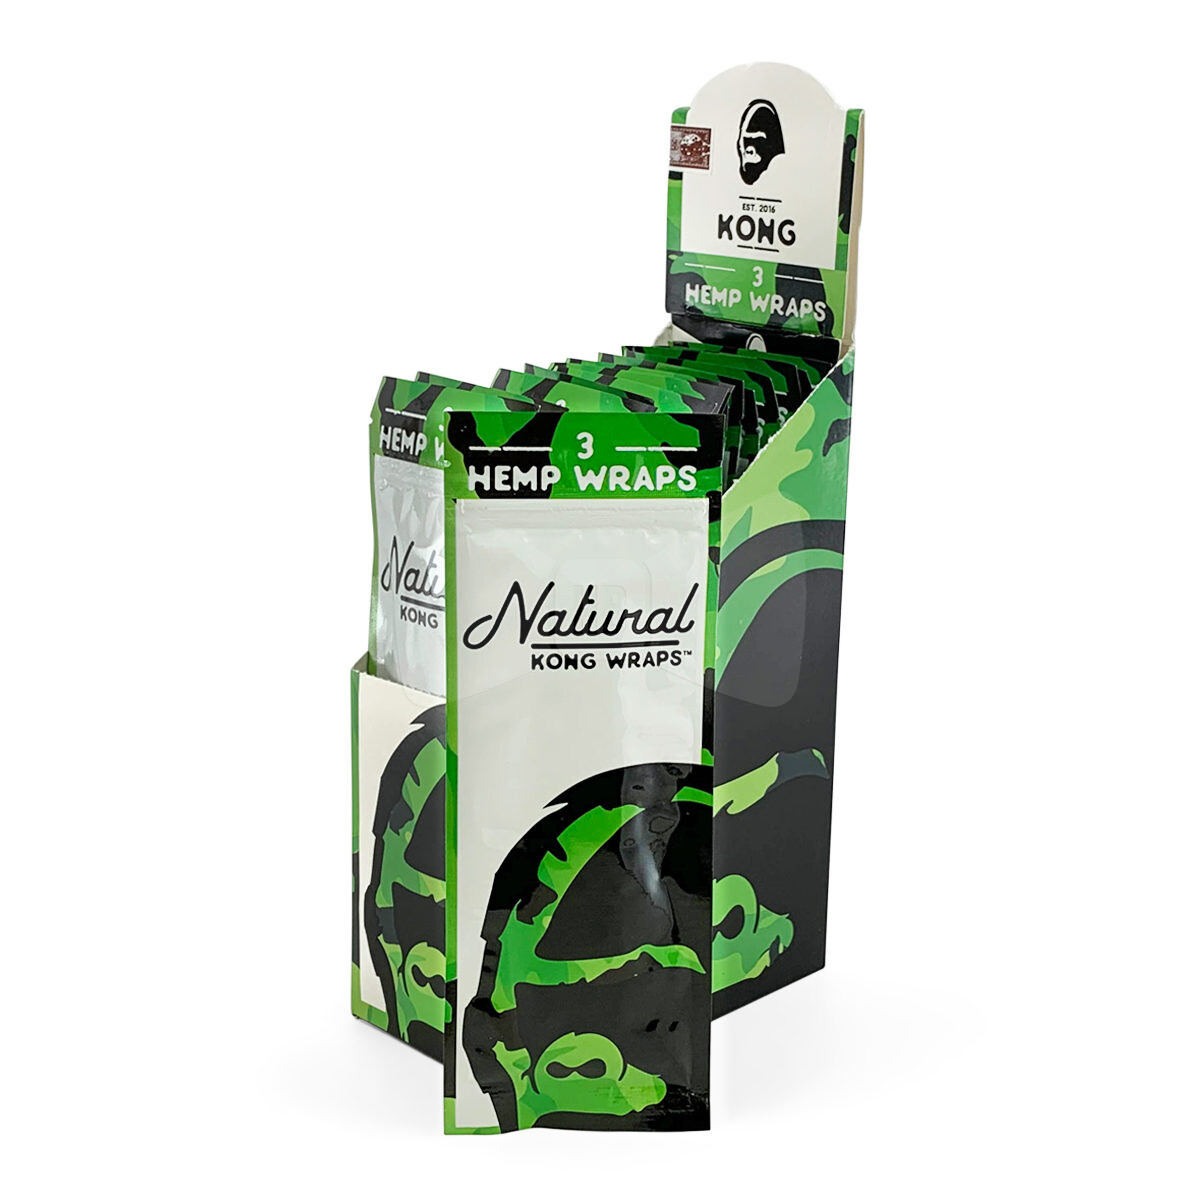 Natural Kong Wraps